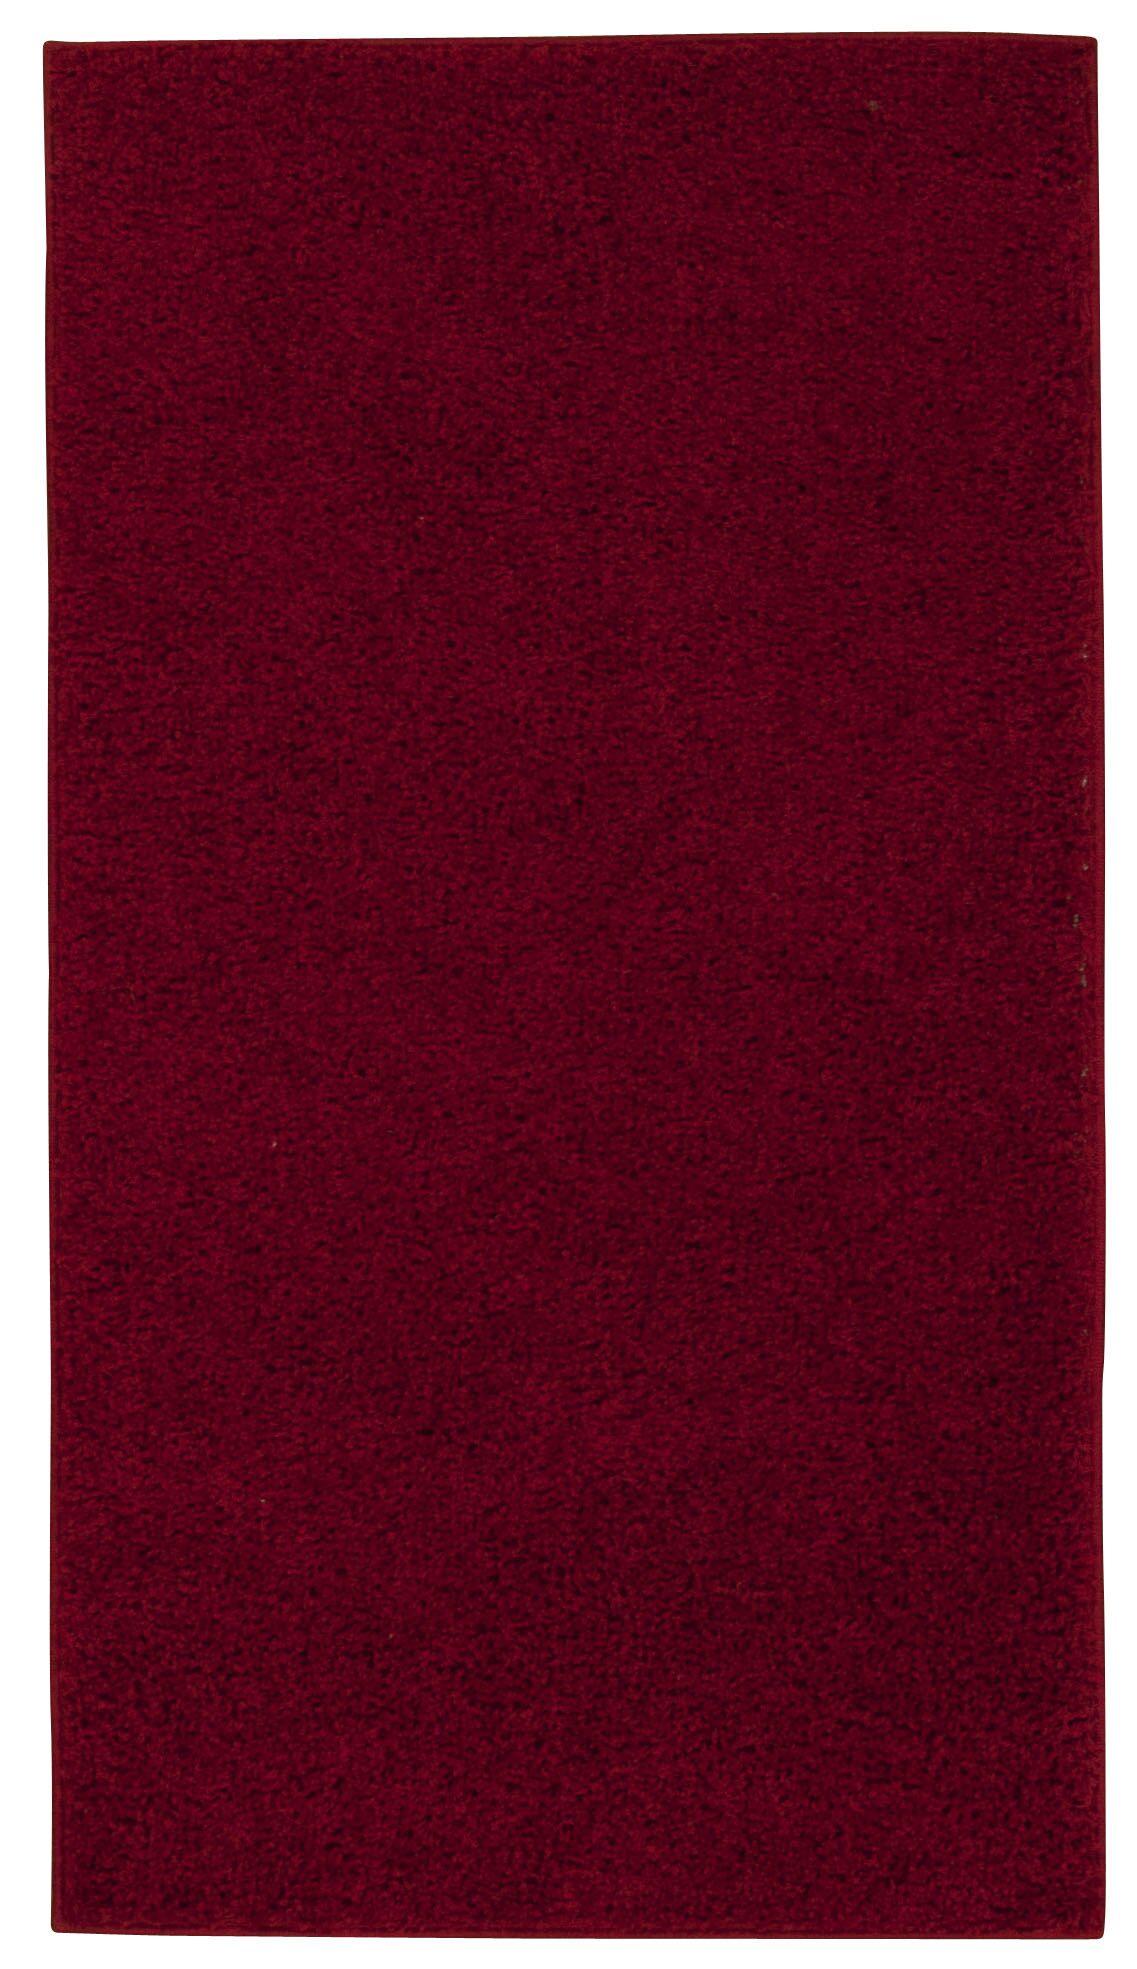 Ribeiro Red Rug Rug Size: Rectangle 8'2